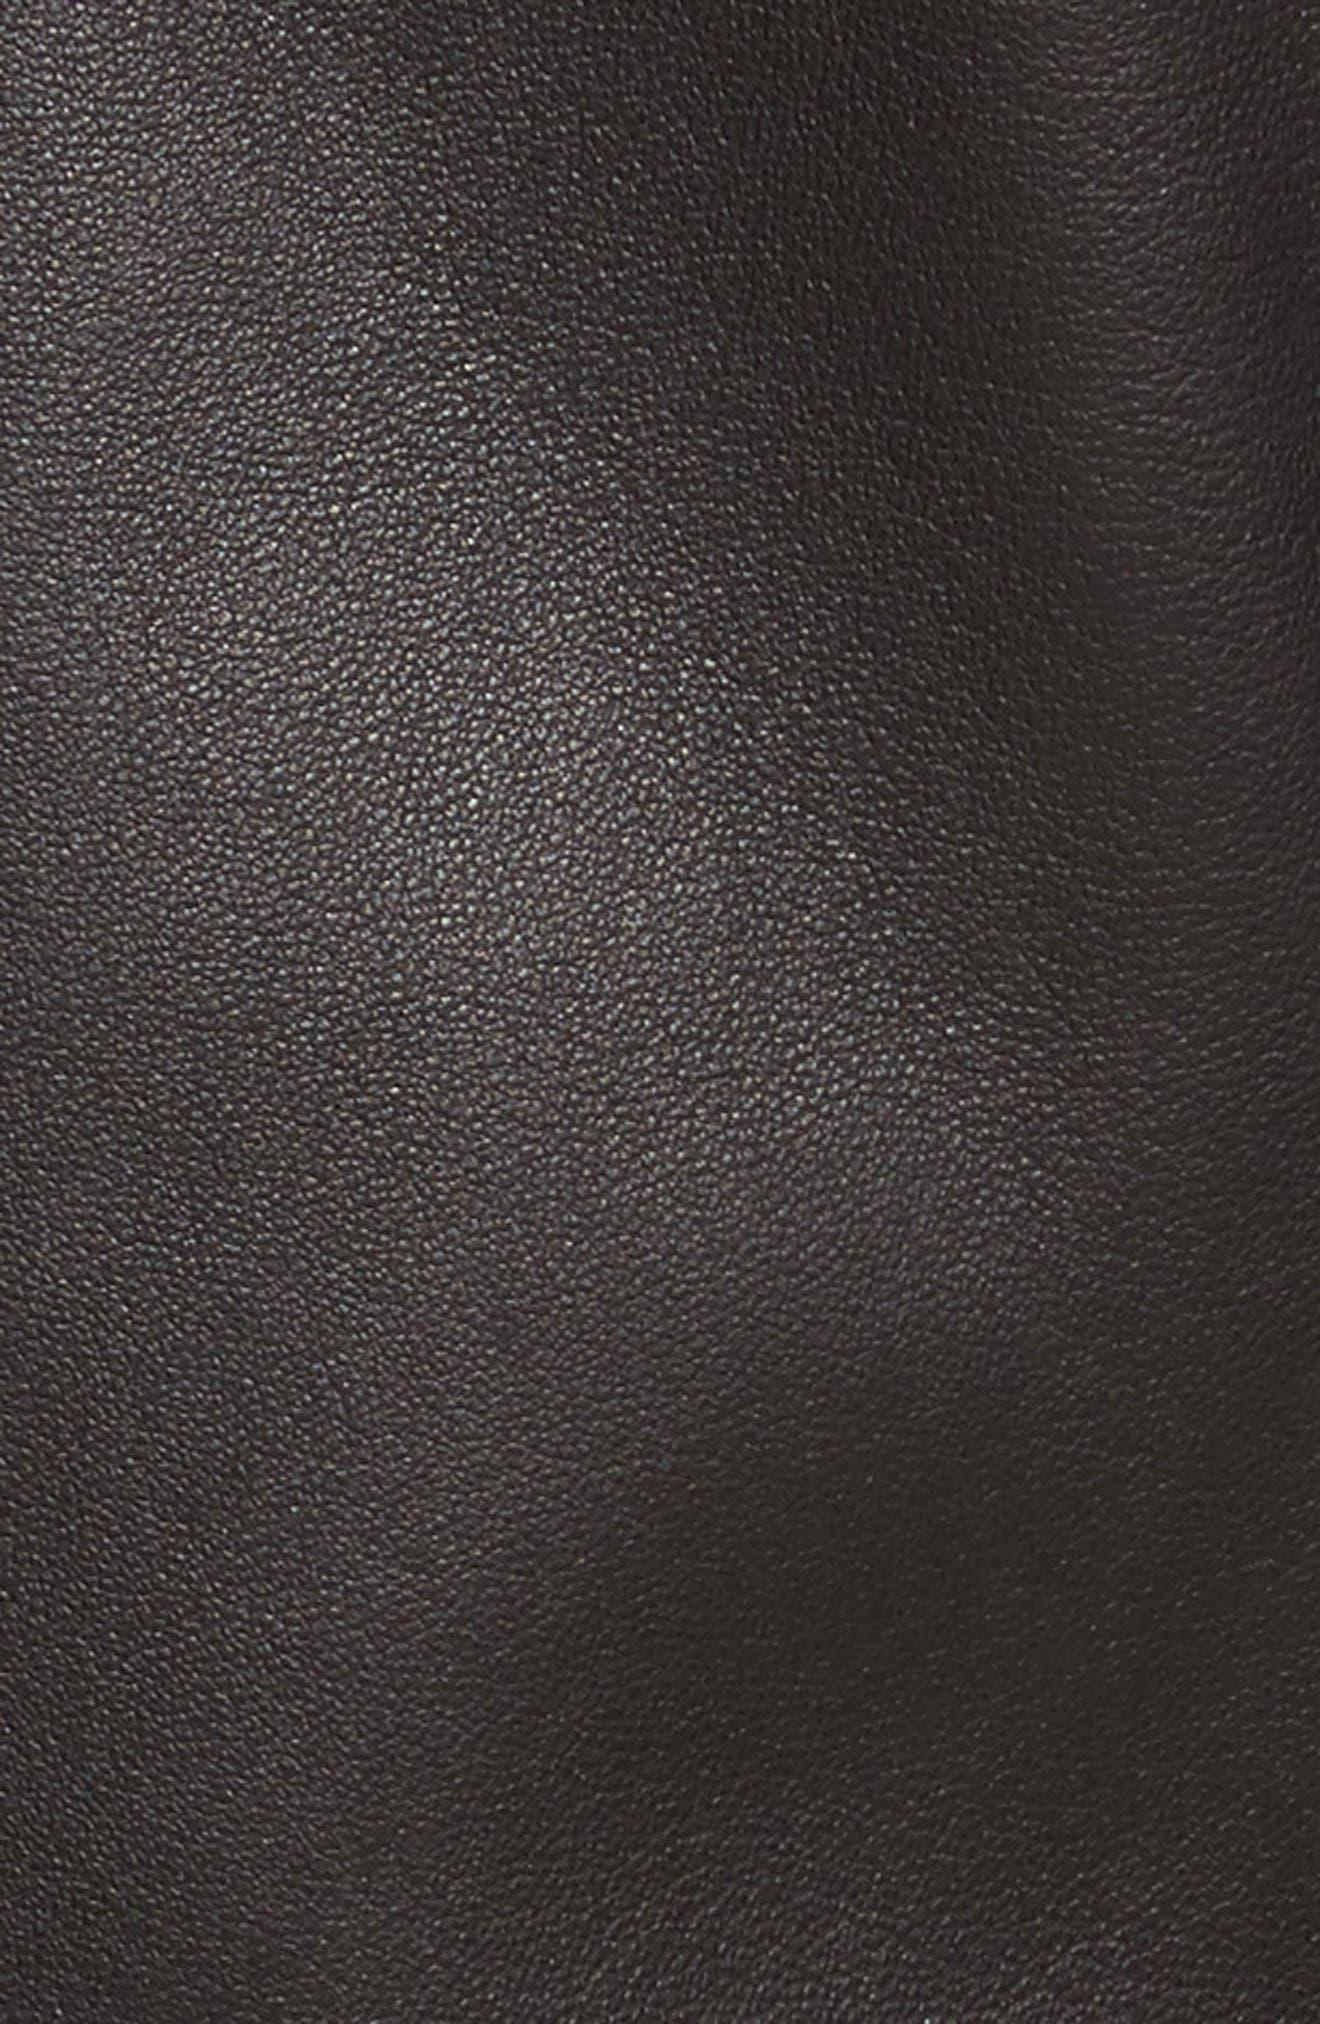 Painted Edge Shrunken Leather Moto Jacket,                             Alternate thumbnail 5, color,                             001